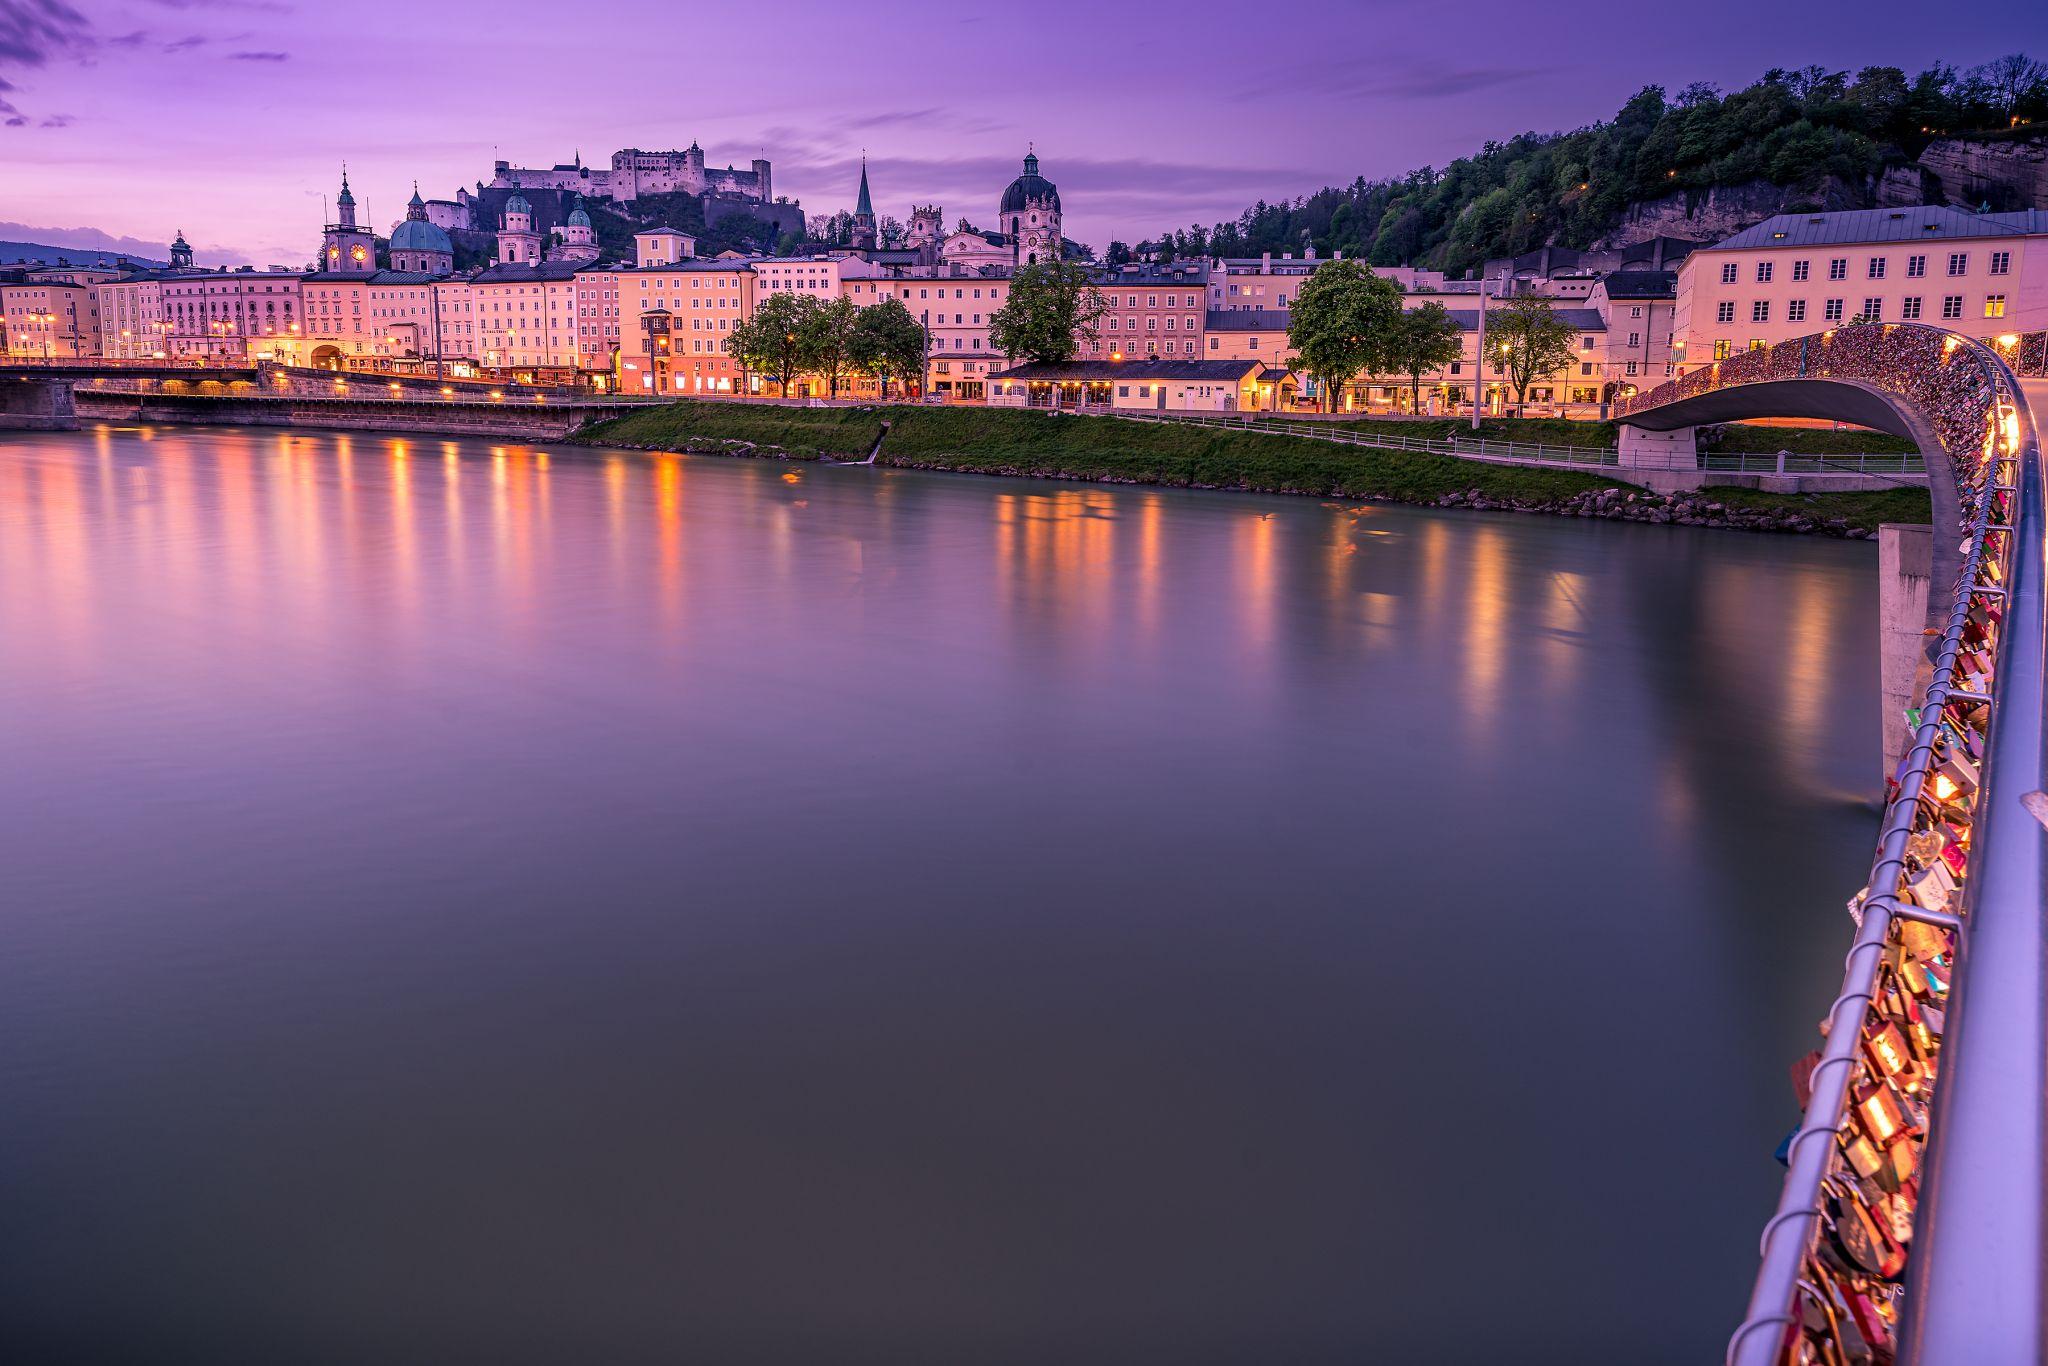 Markatsteg with the City of Salzburg, Austria